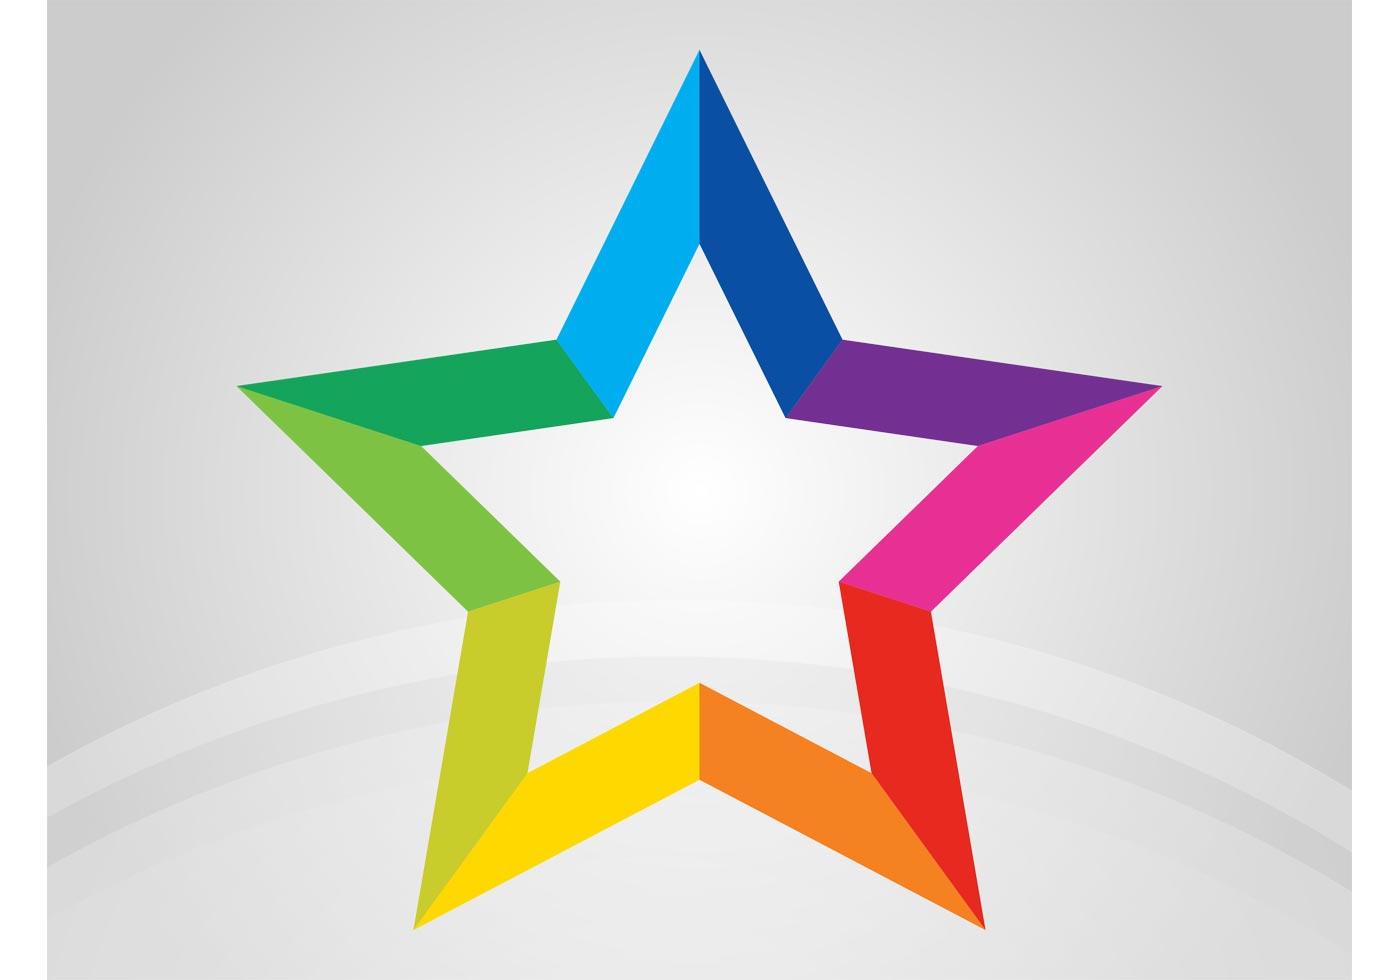 rainbow star download free vector art stock graphics